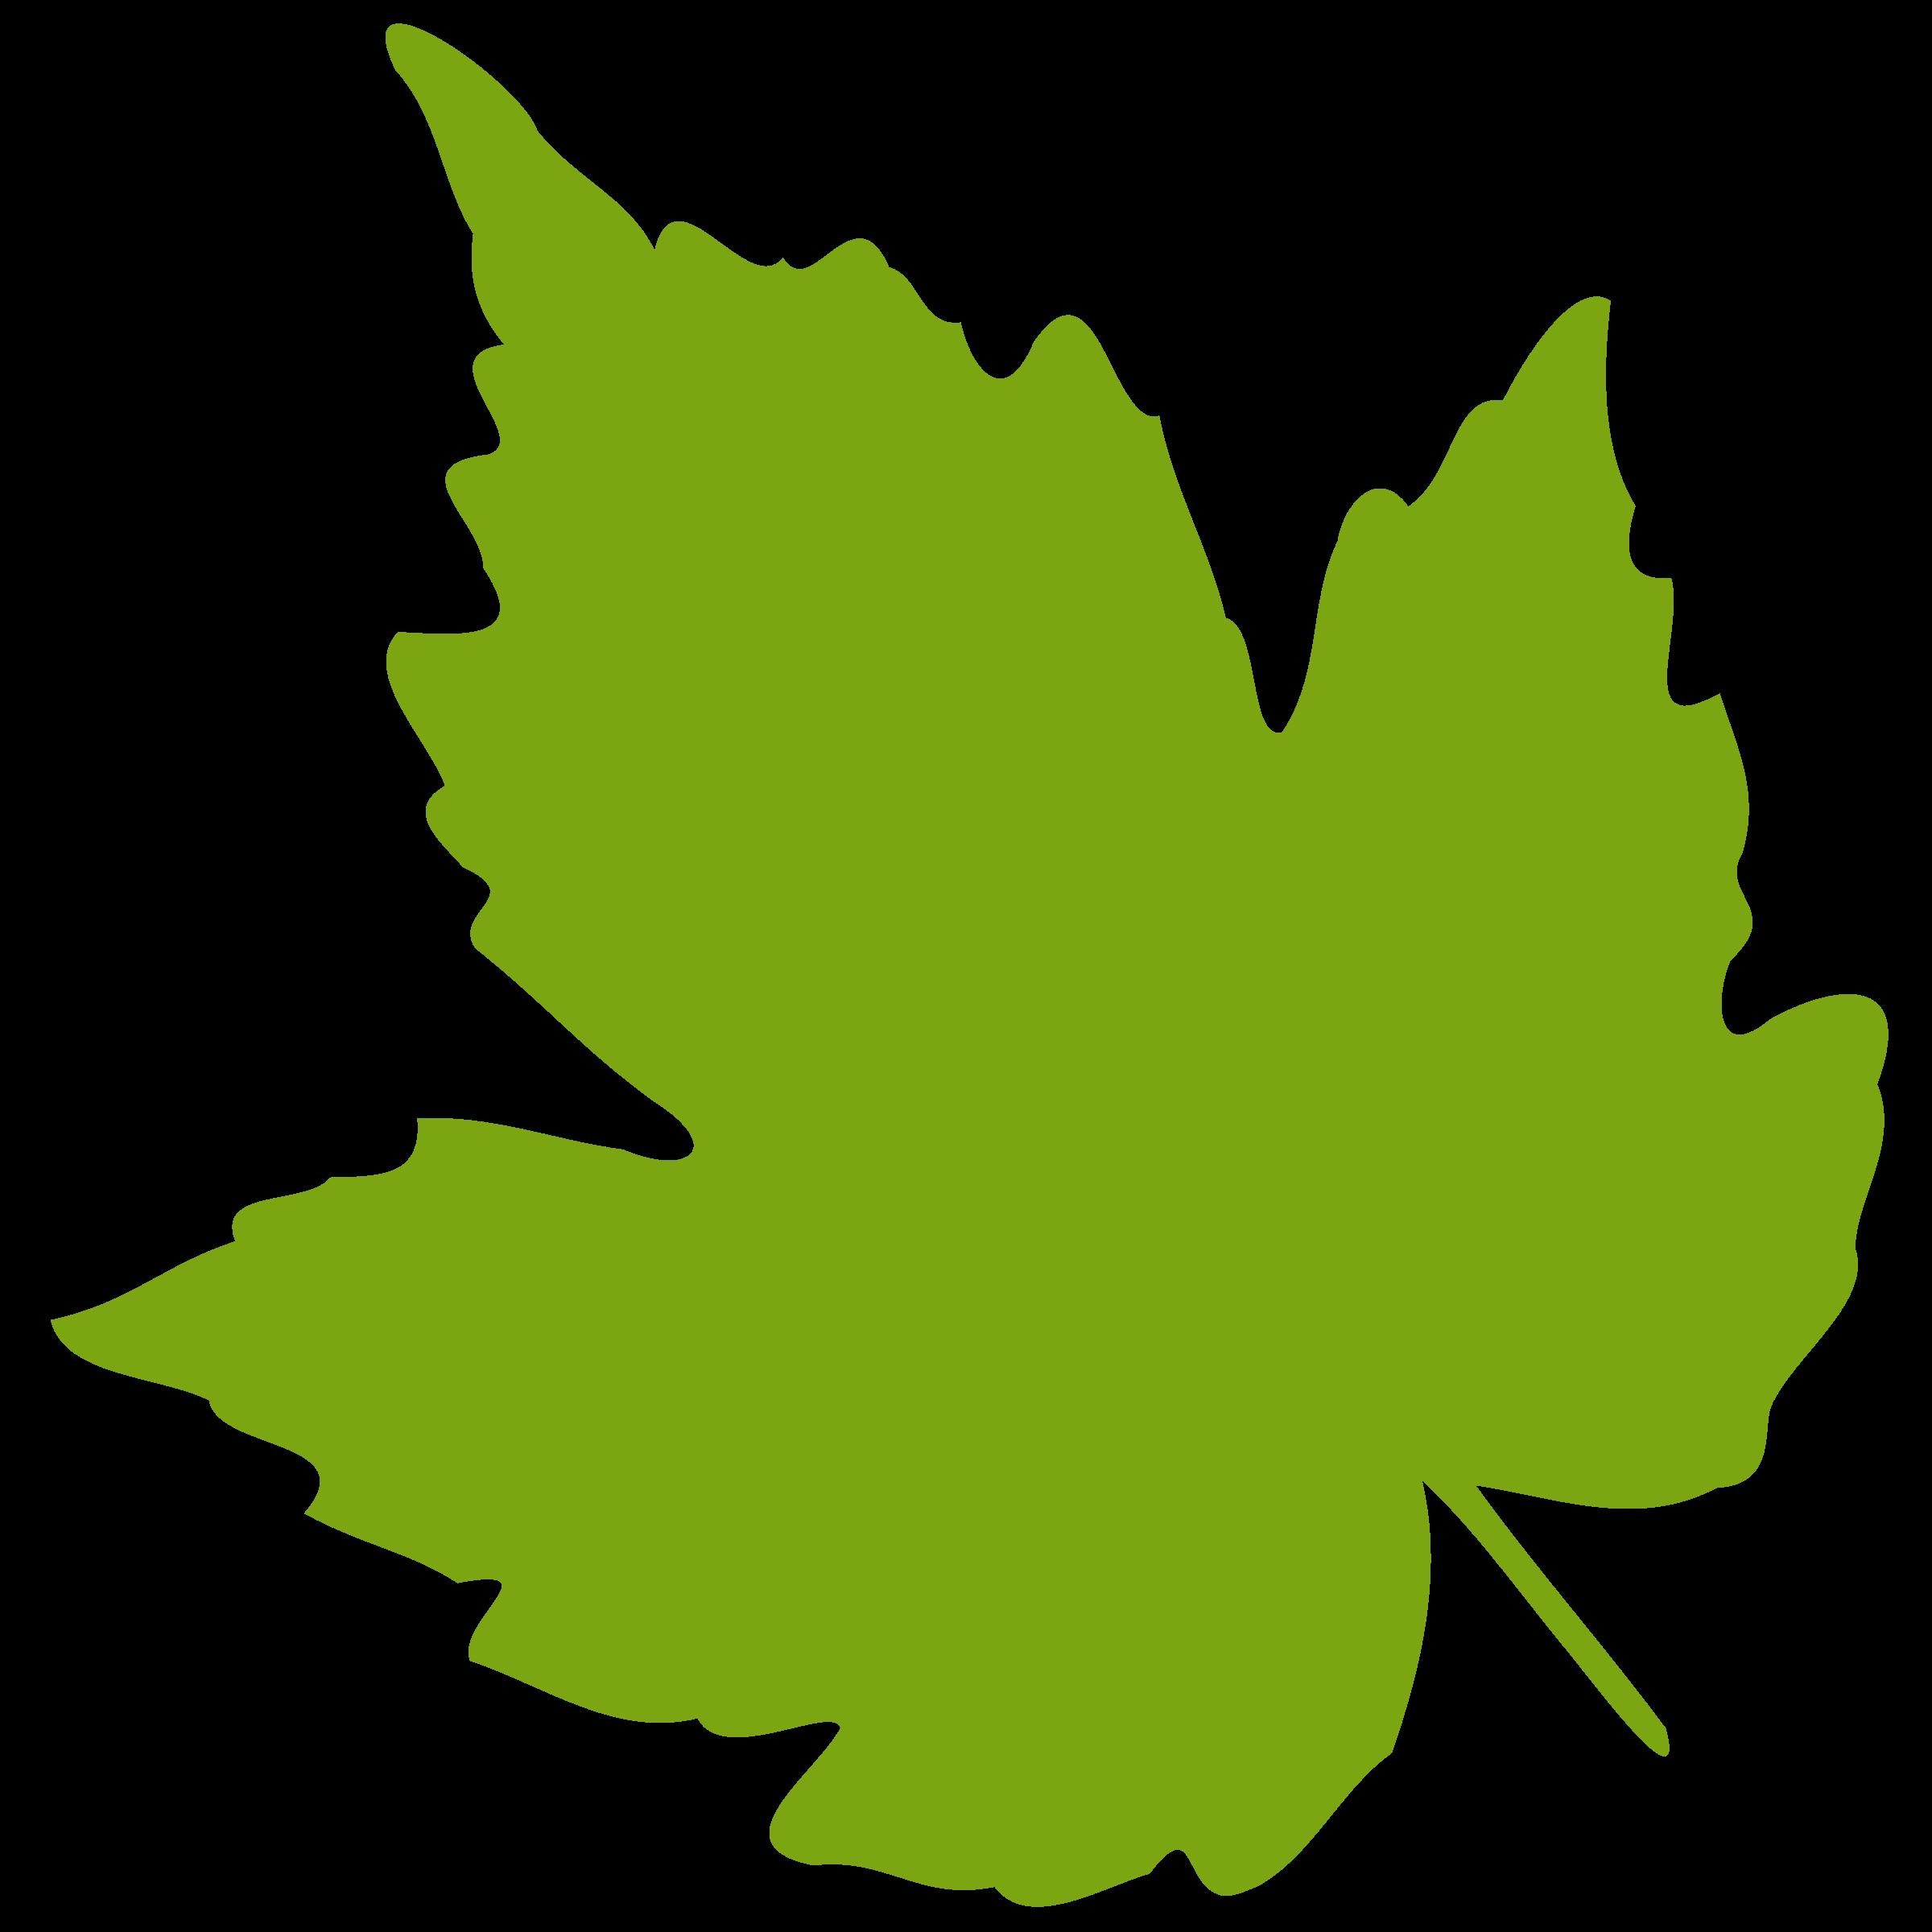 2400x2400 Grape Leaf Clipart